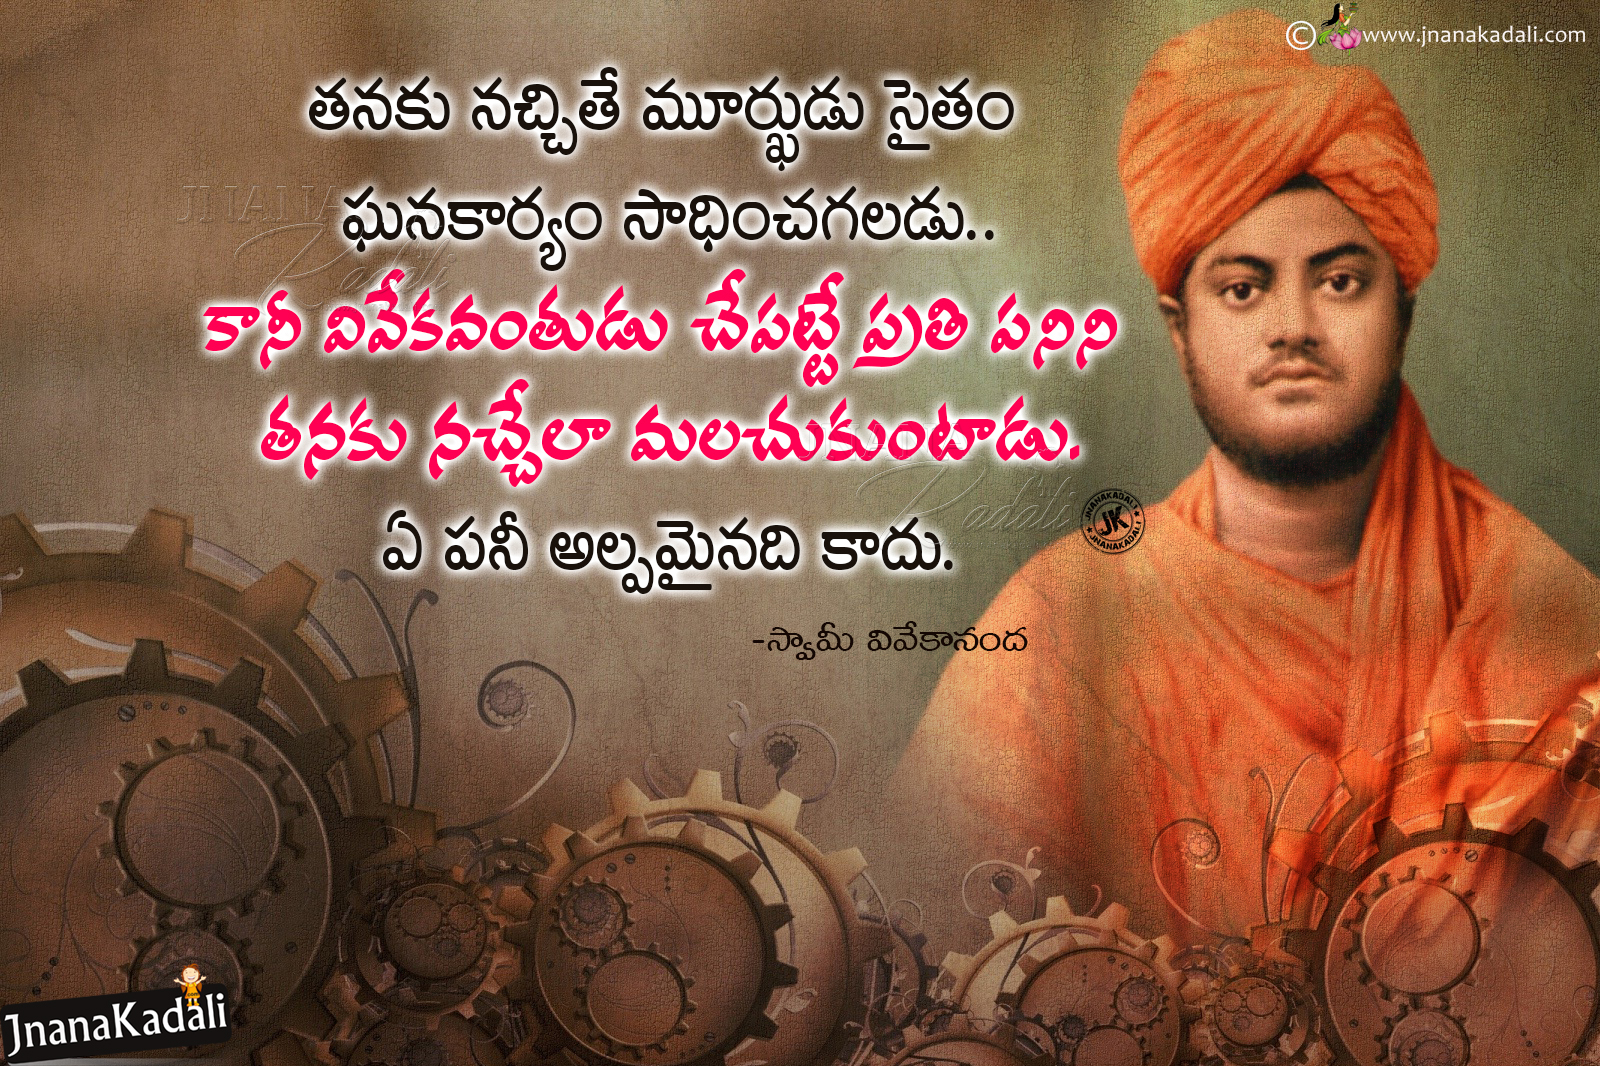 Telugu Swami Vivekananca Motivational Sayings With - Youth Swami Vivekananda Quotes In Telugu - HD Wallpaper